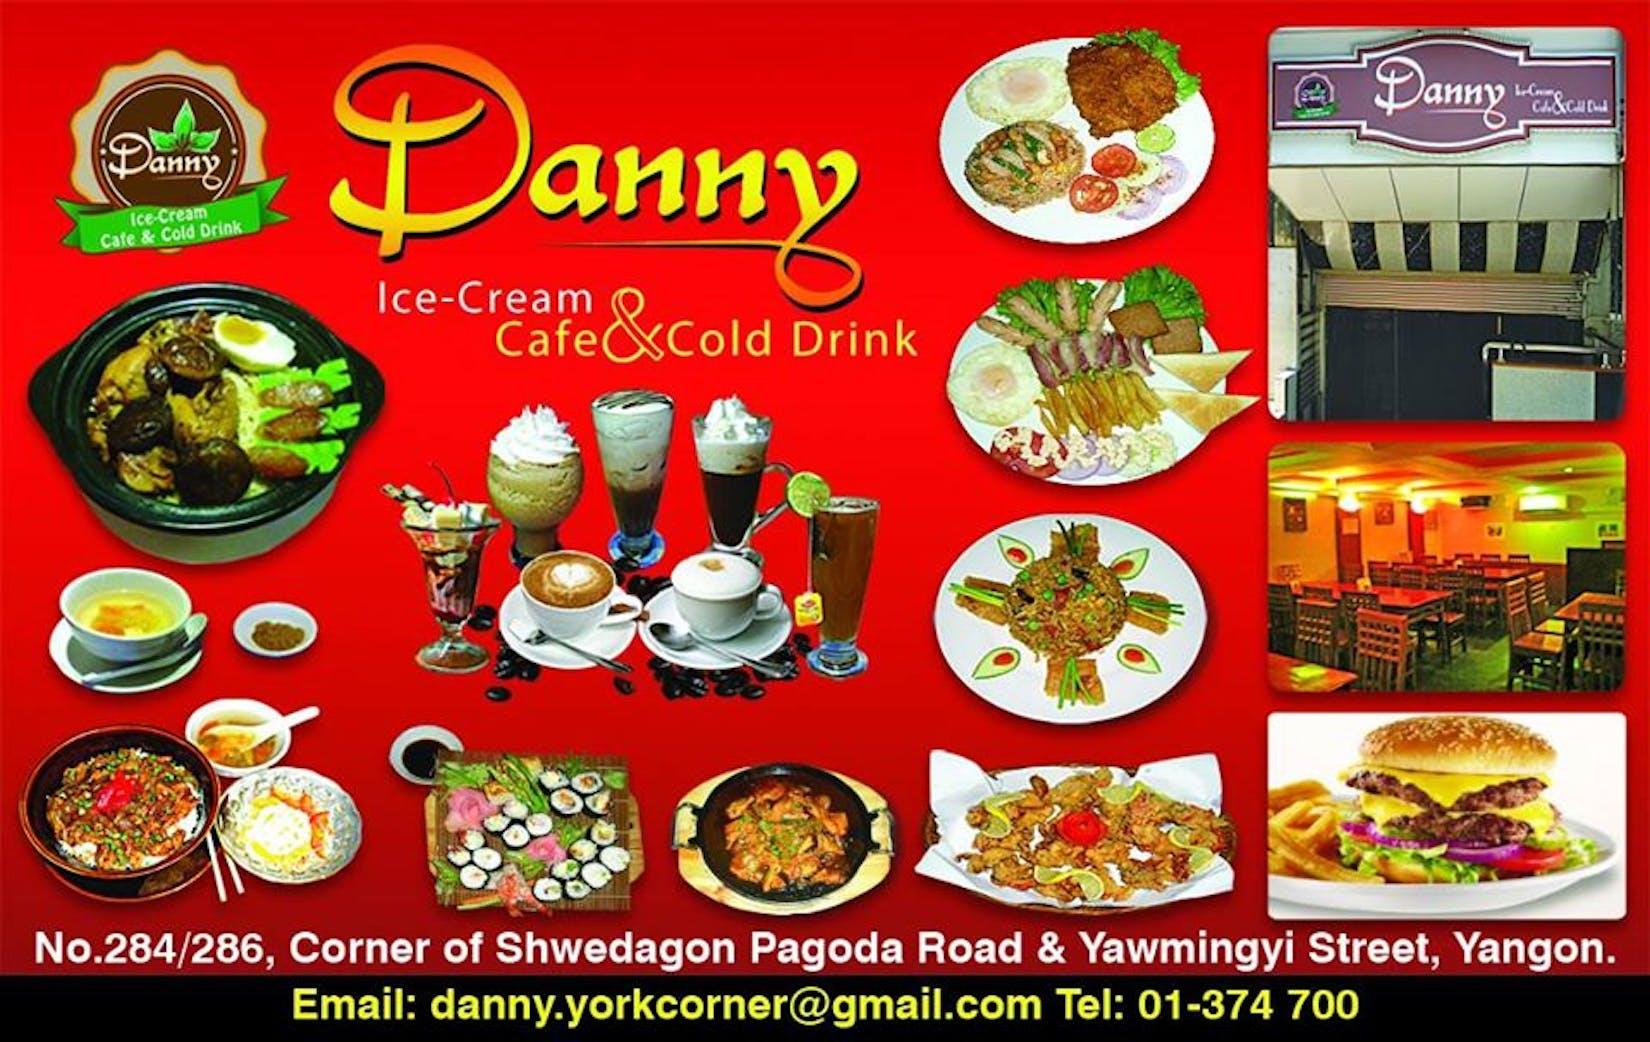 Danny Cafe & Cold Drink | yathar